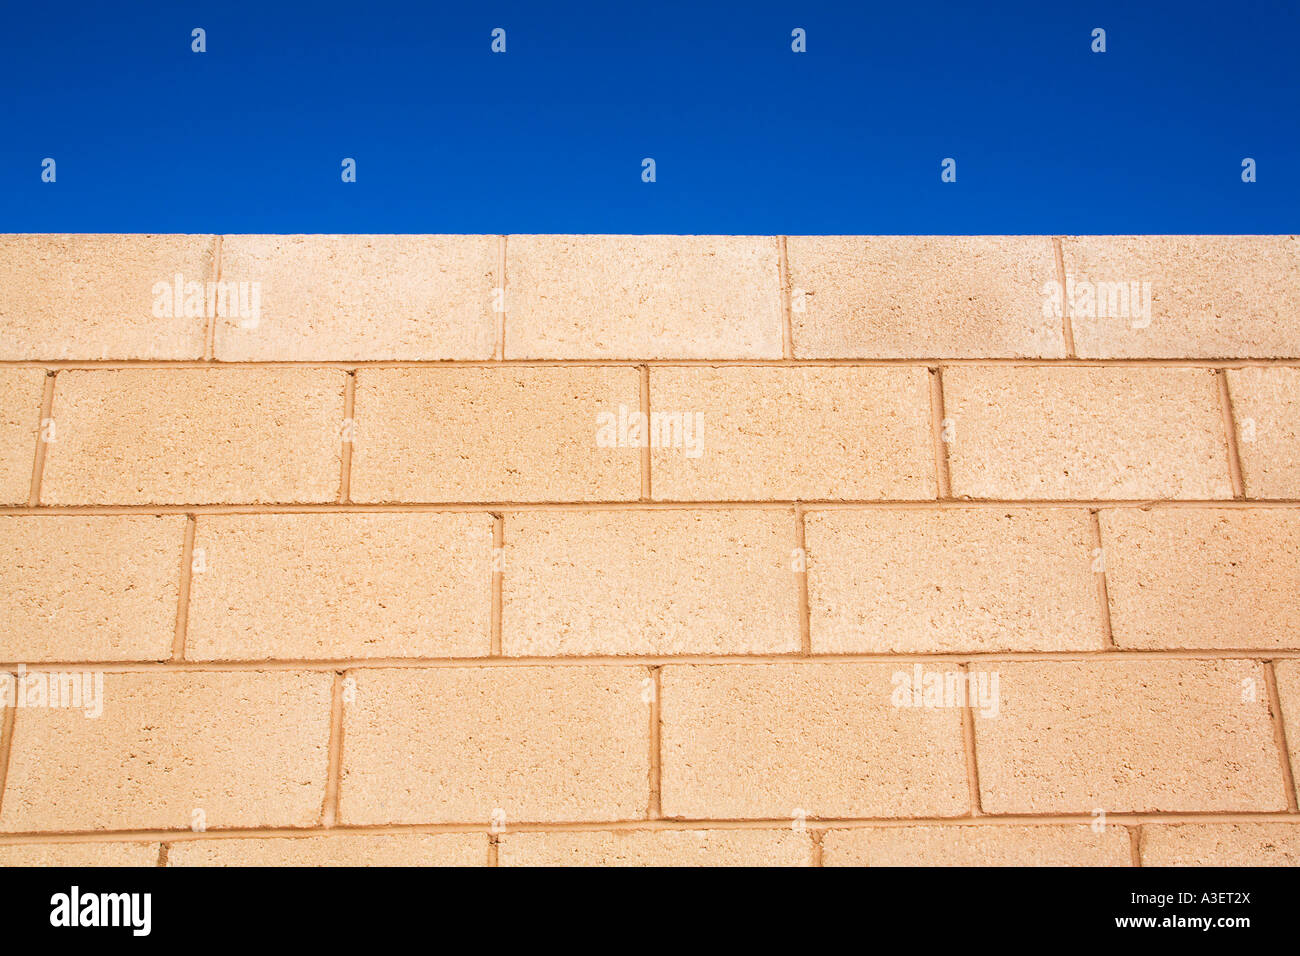 Cinder block wall Stock Photo: 10764577 - Alamy